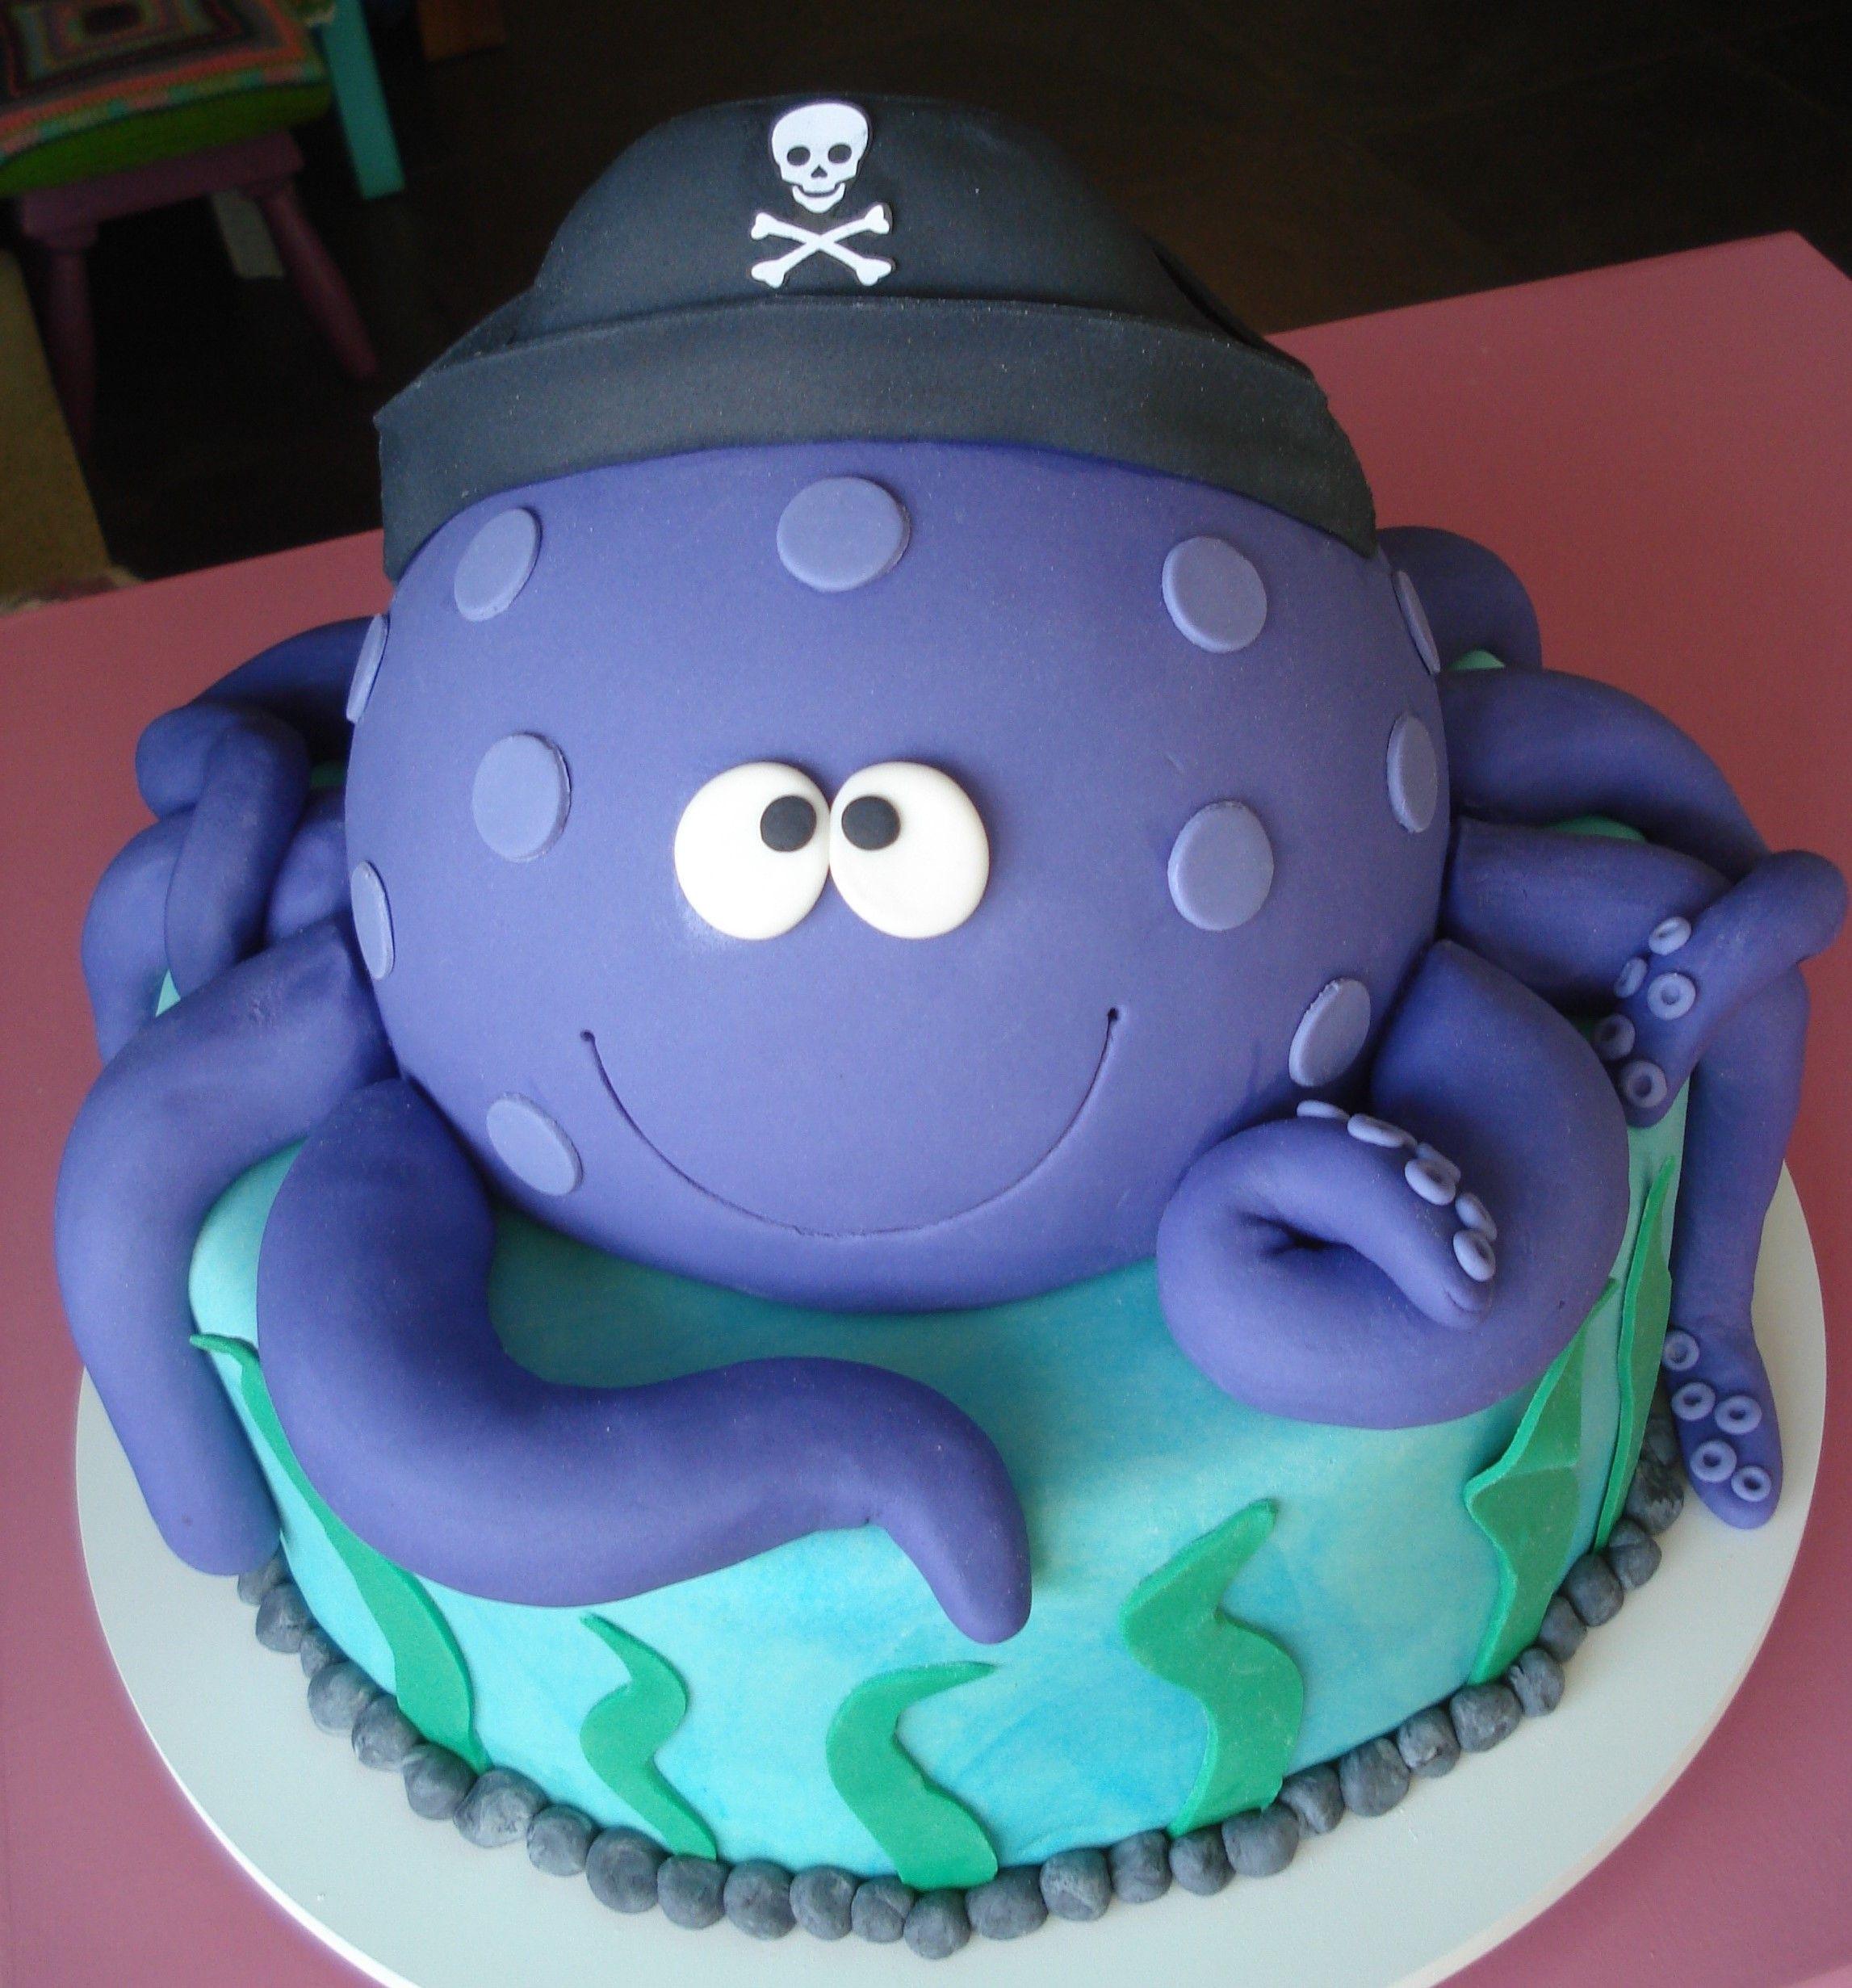 Cake ideas on pinterest pirate cakes marshmallow fondant and - My Cupcake Addiction Elise Strachan